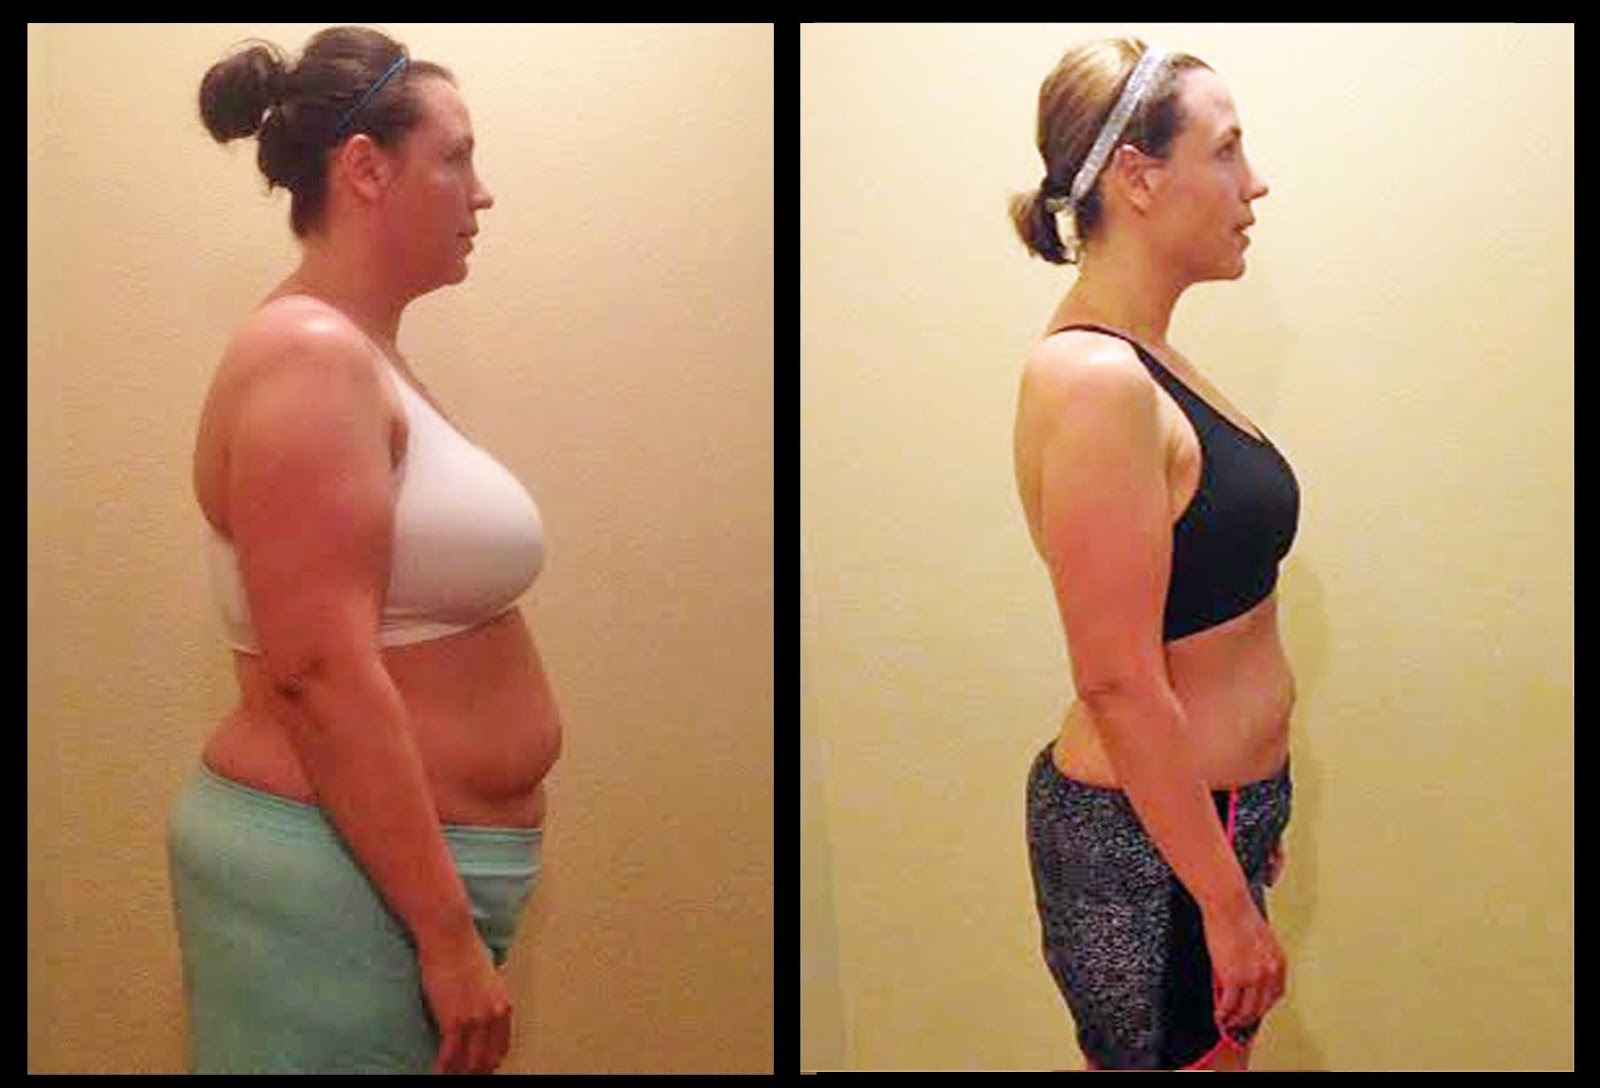 диета медиков фото до и после купол